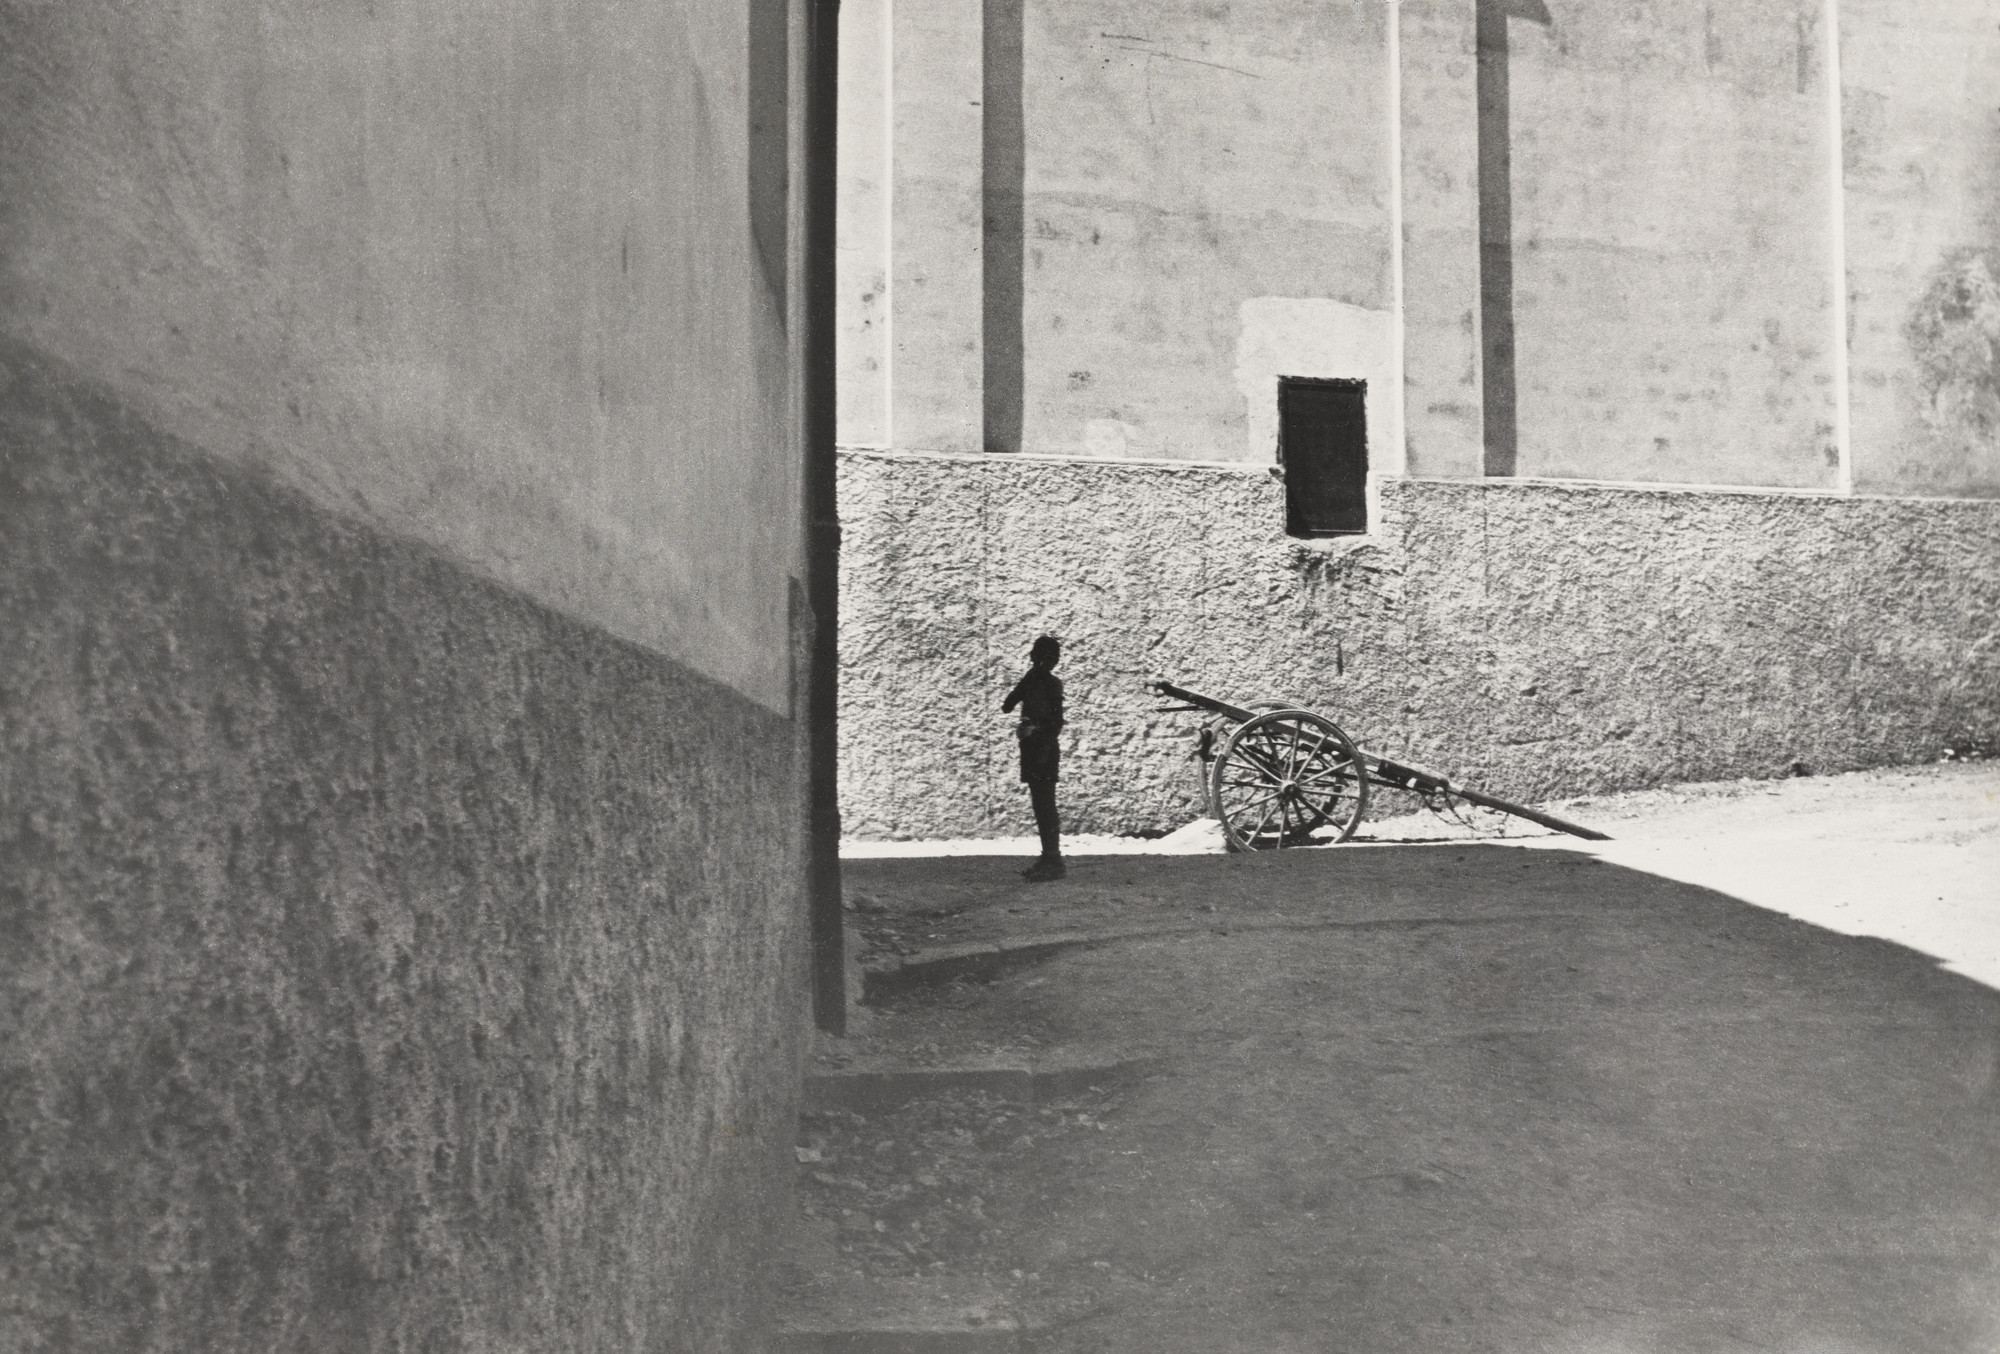 Henri Cartier-Bresson. Salerno, Italy. 1933 | MoMA